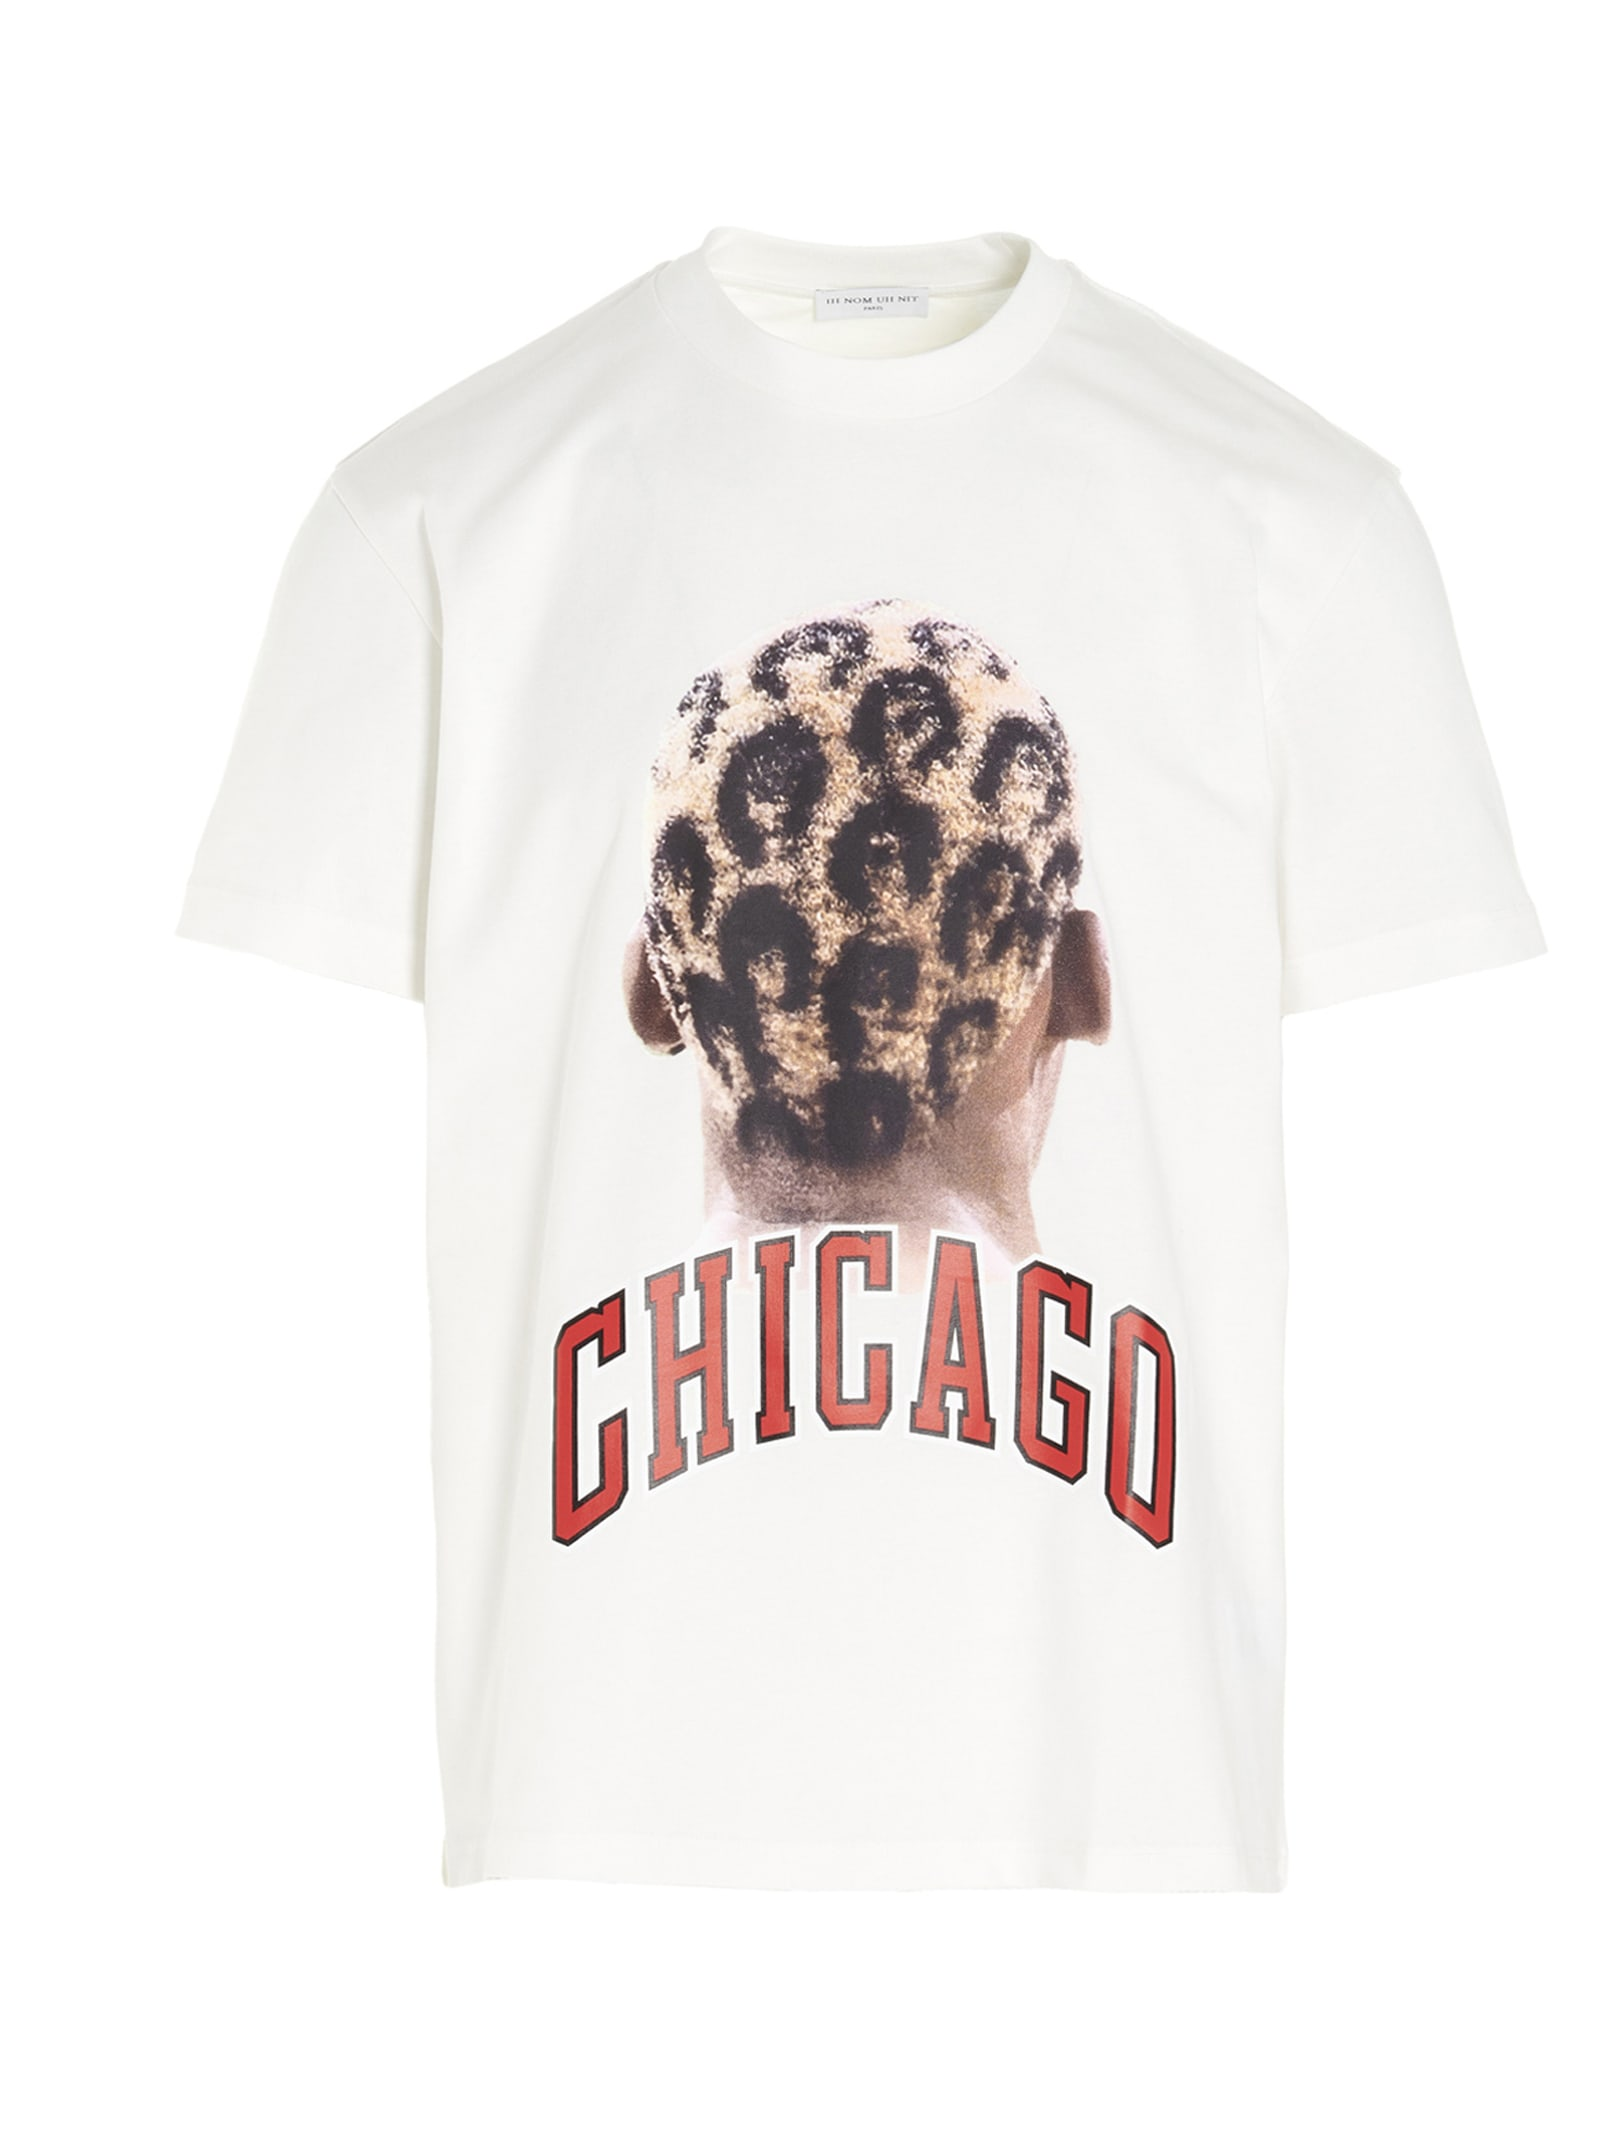 Ih Nom Uh Nit T-shirts CHICAGO PLAYER T-SHIRT